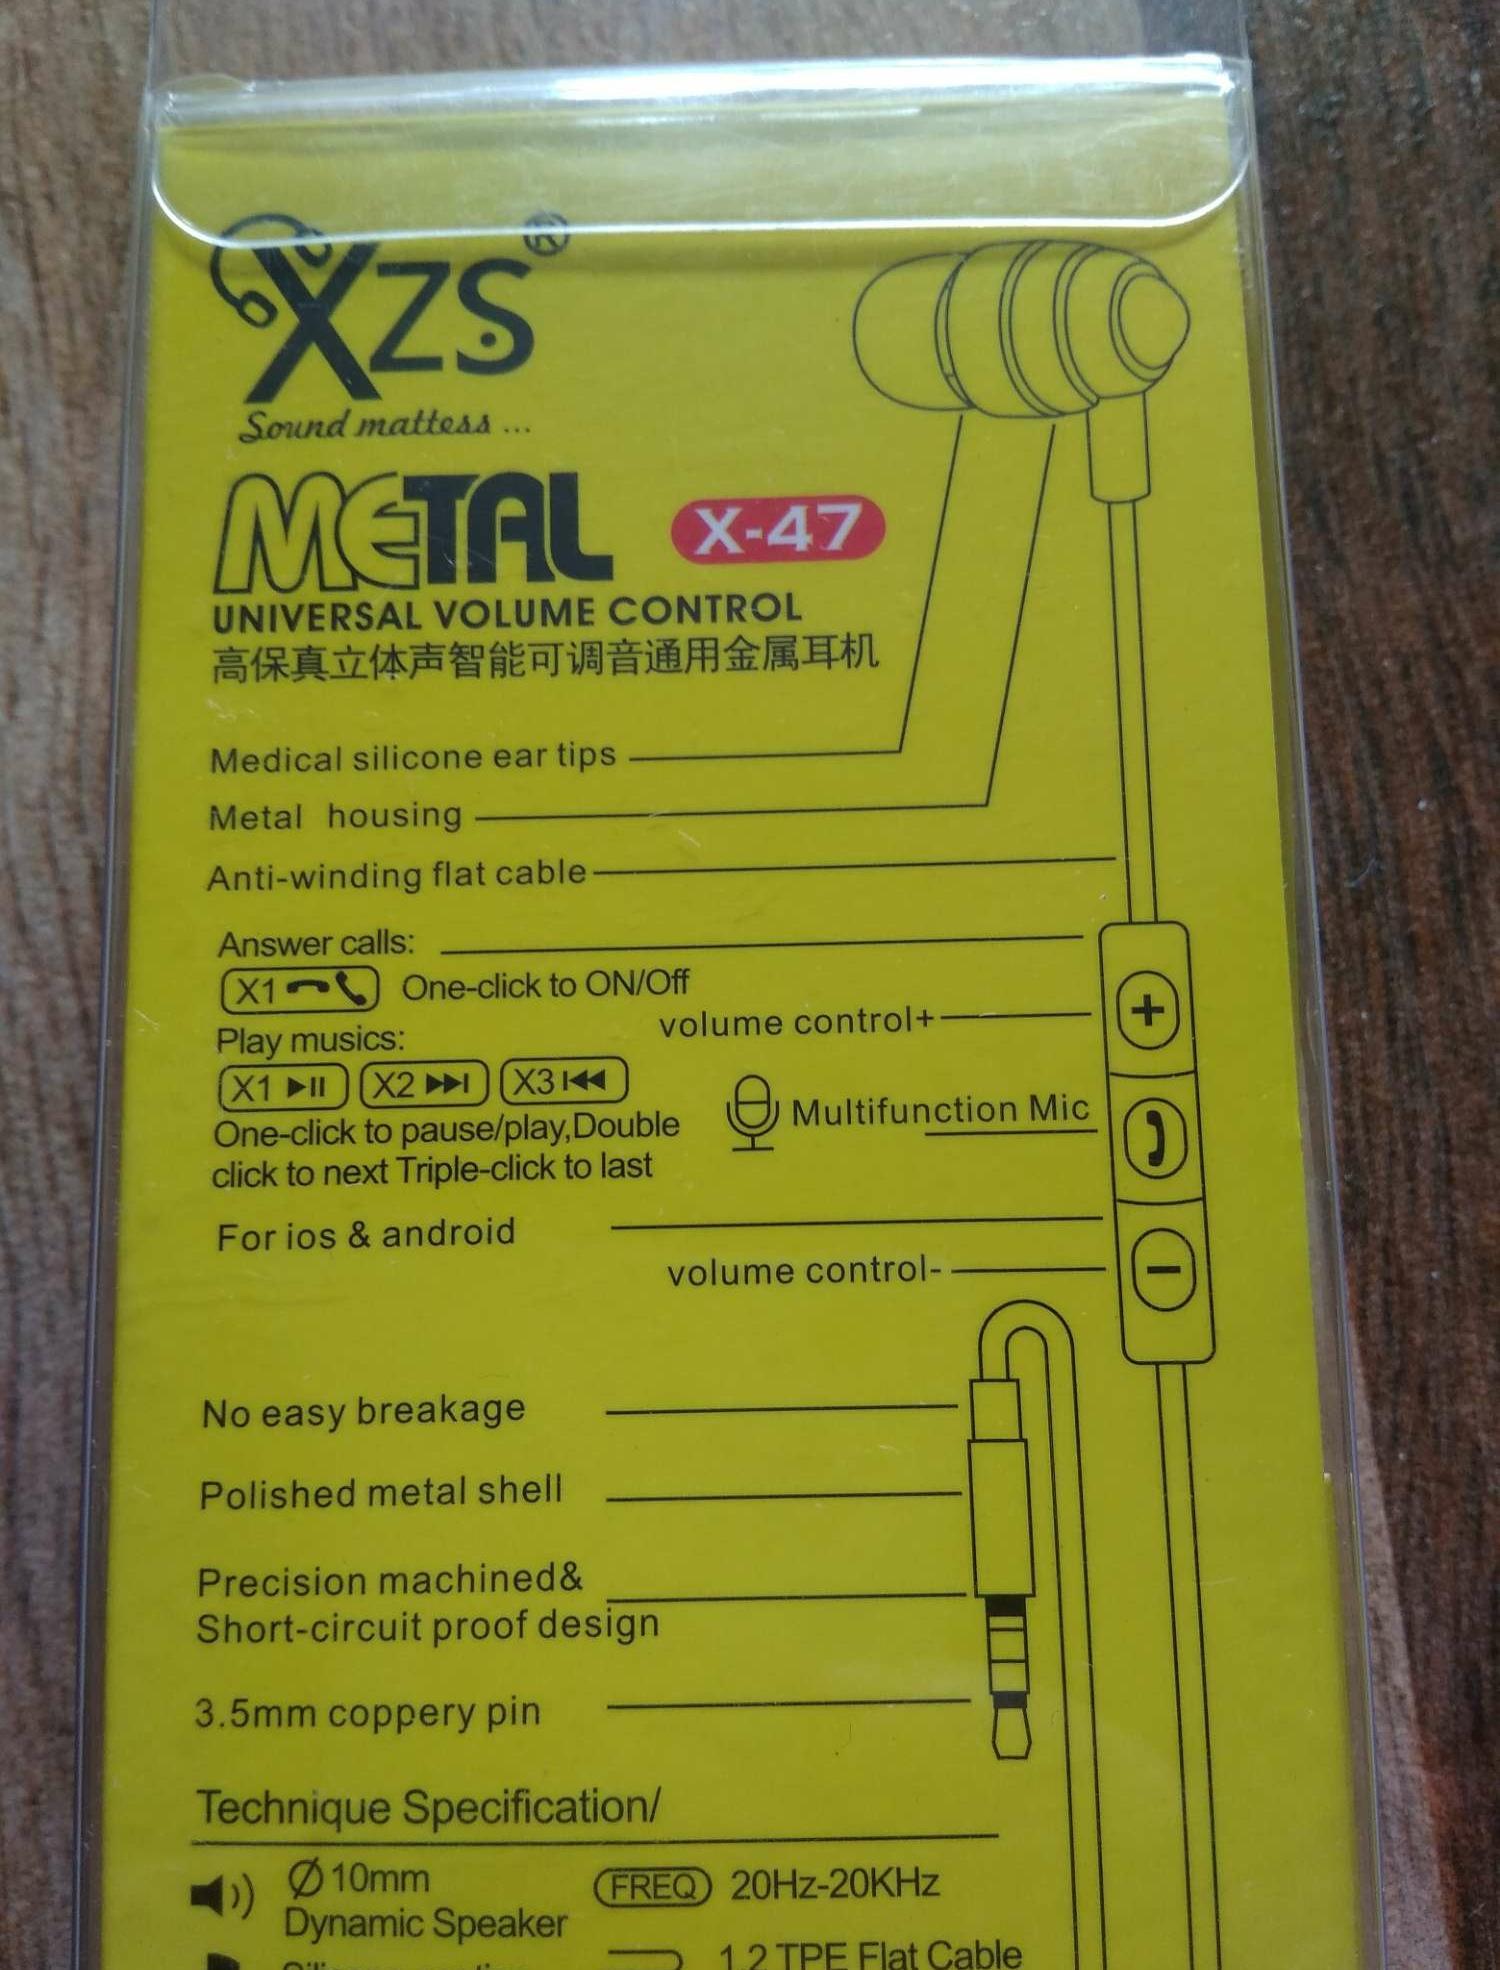 Cabang Pinus Natal Rotan Natal - Daftar Harga Terlengkap Indonesia - Headset xzs - 2 Headset